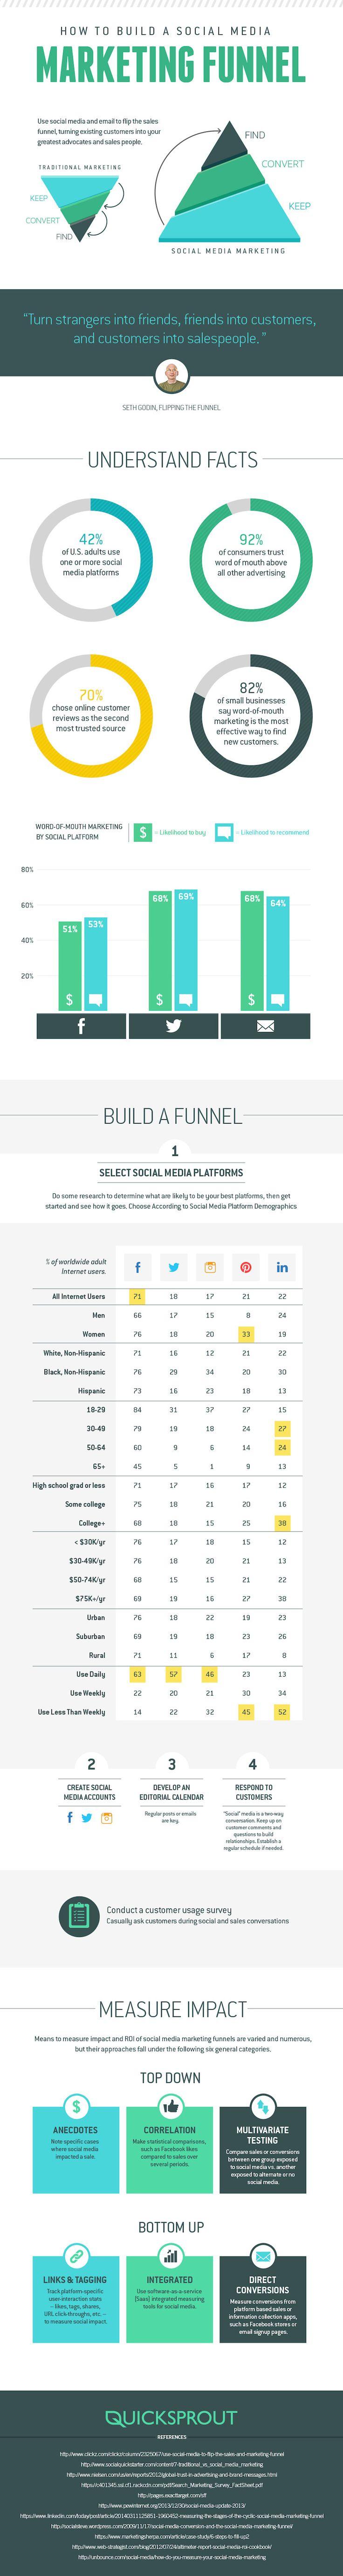 How To Build A Social Media Marketing Funnel #socialmedia #INFOGRAPHIC